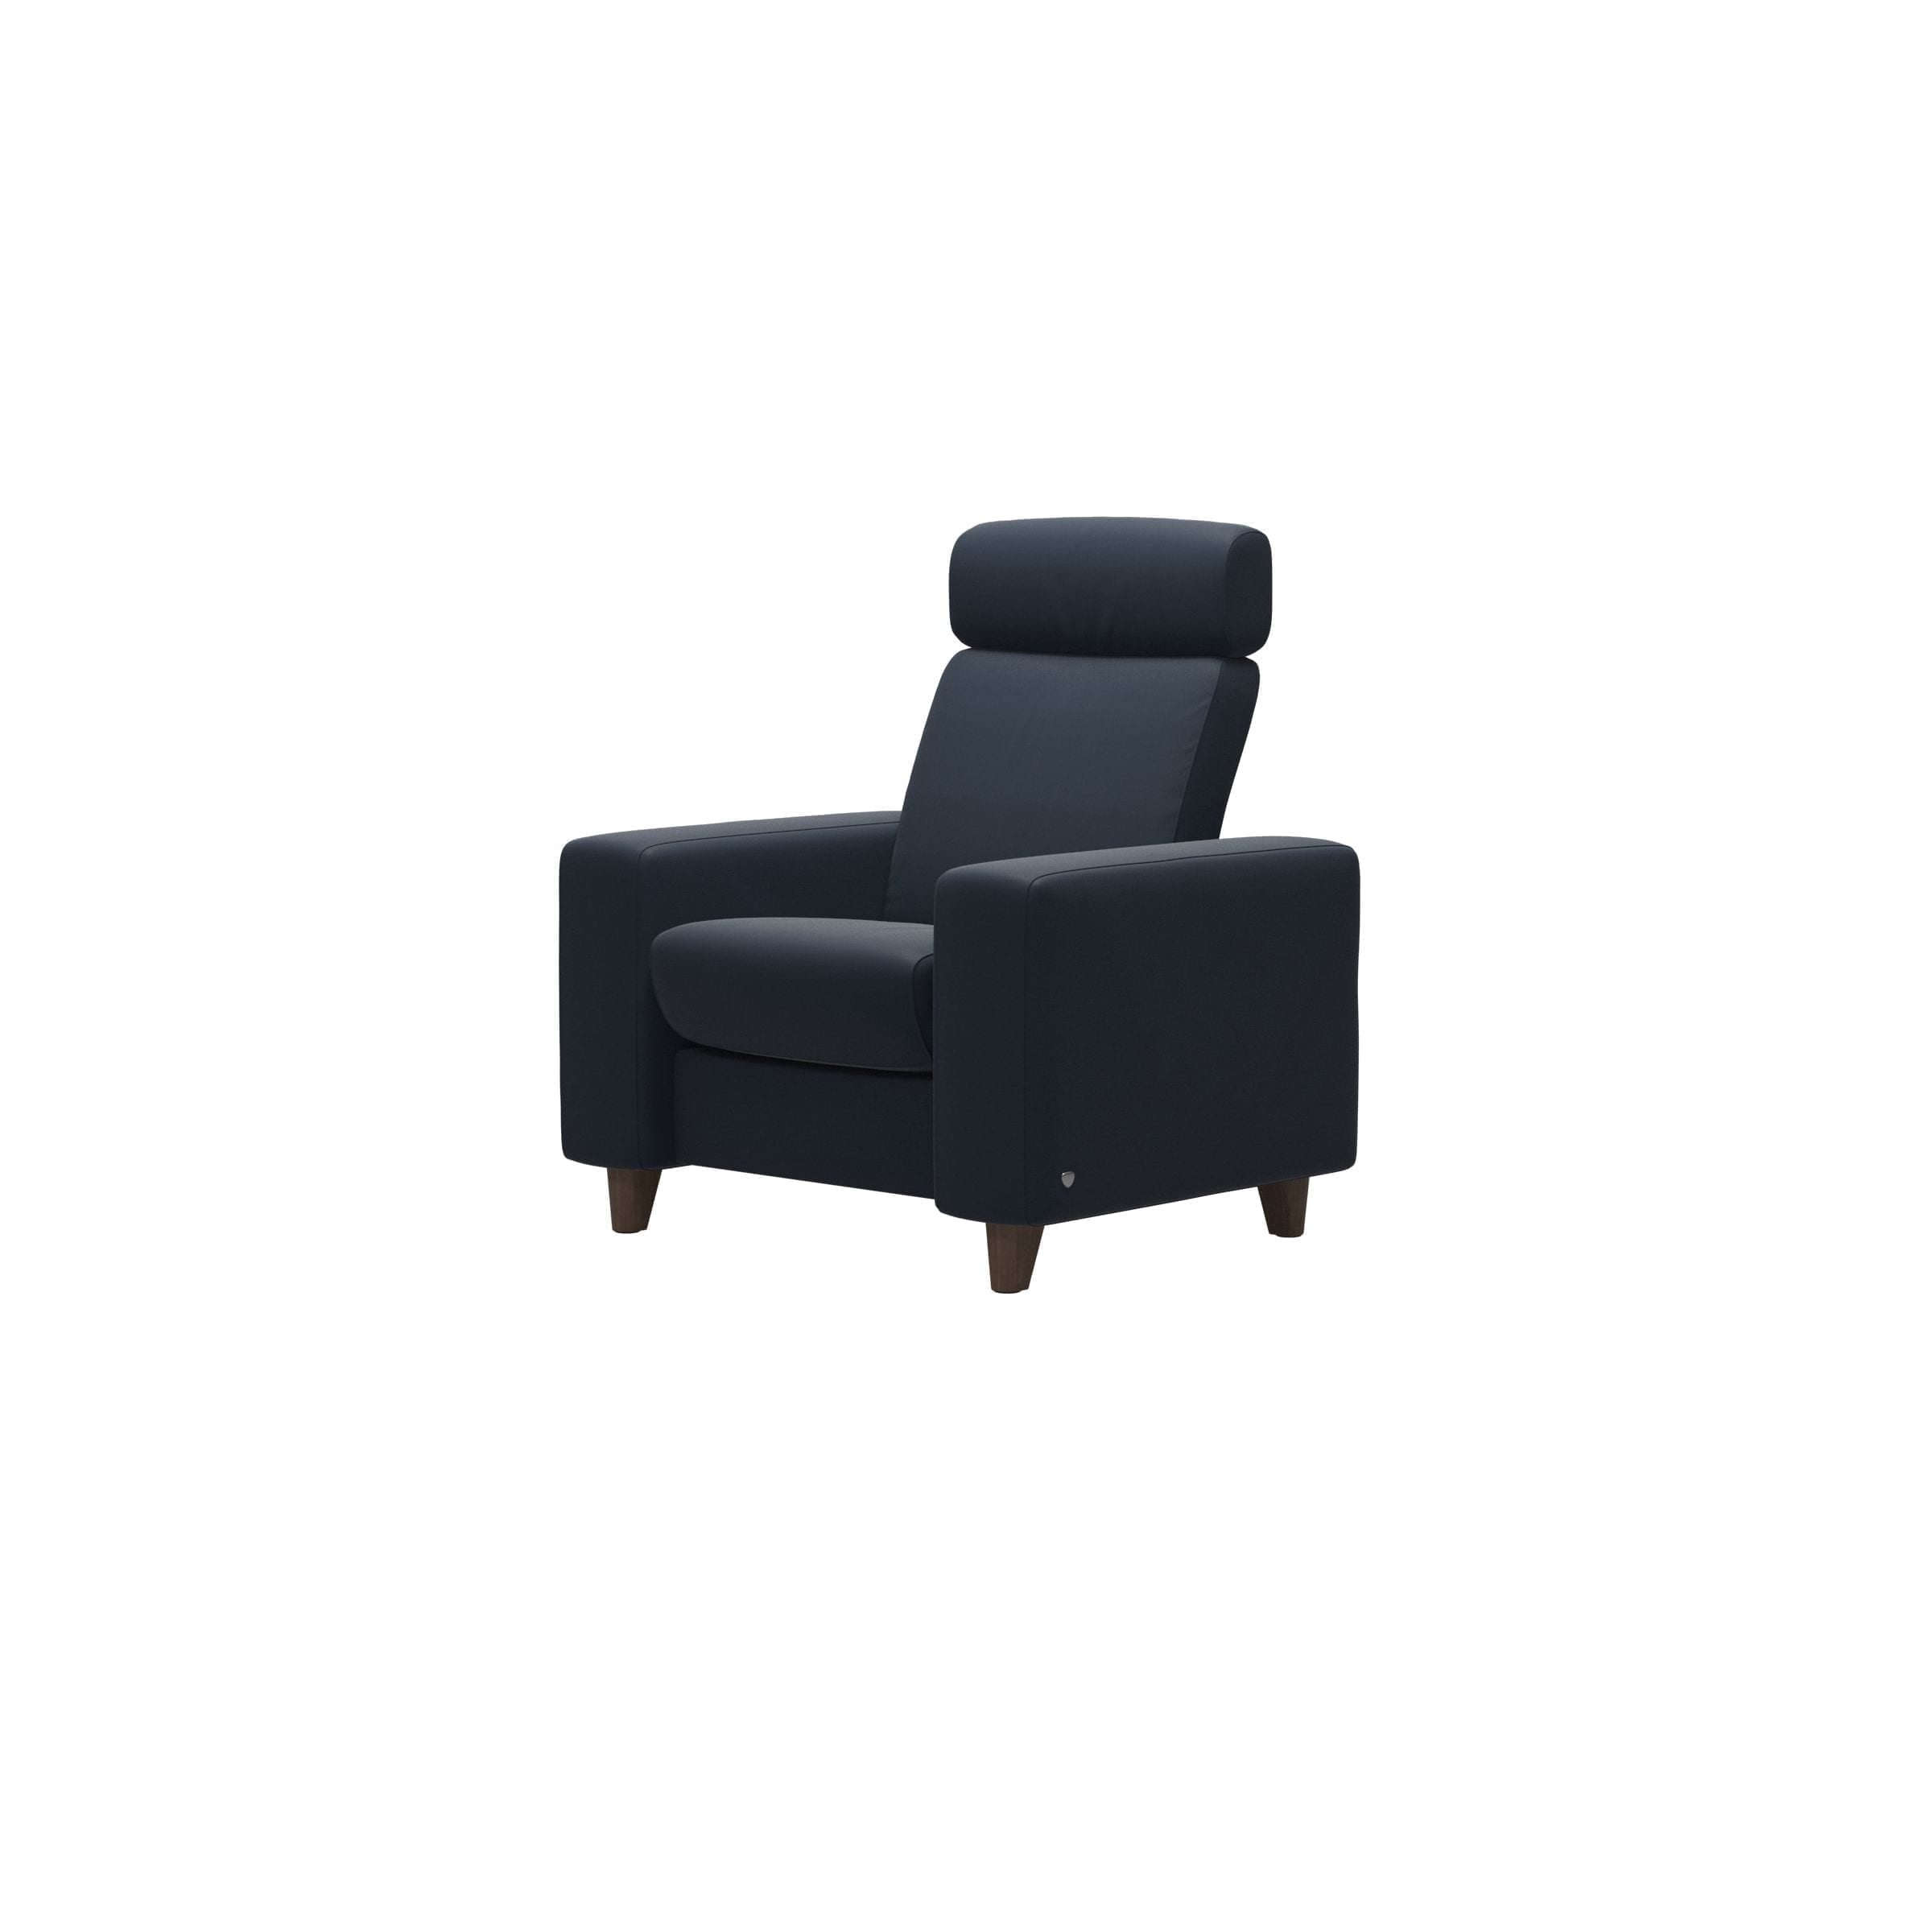 Arion 19 A20 Stressless High Back Chair 3